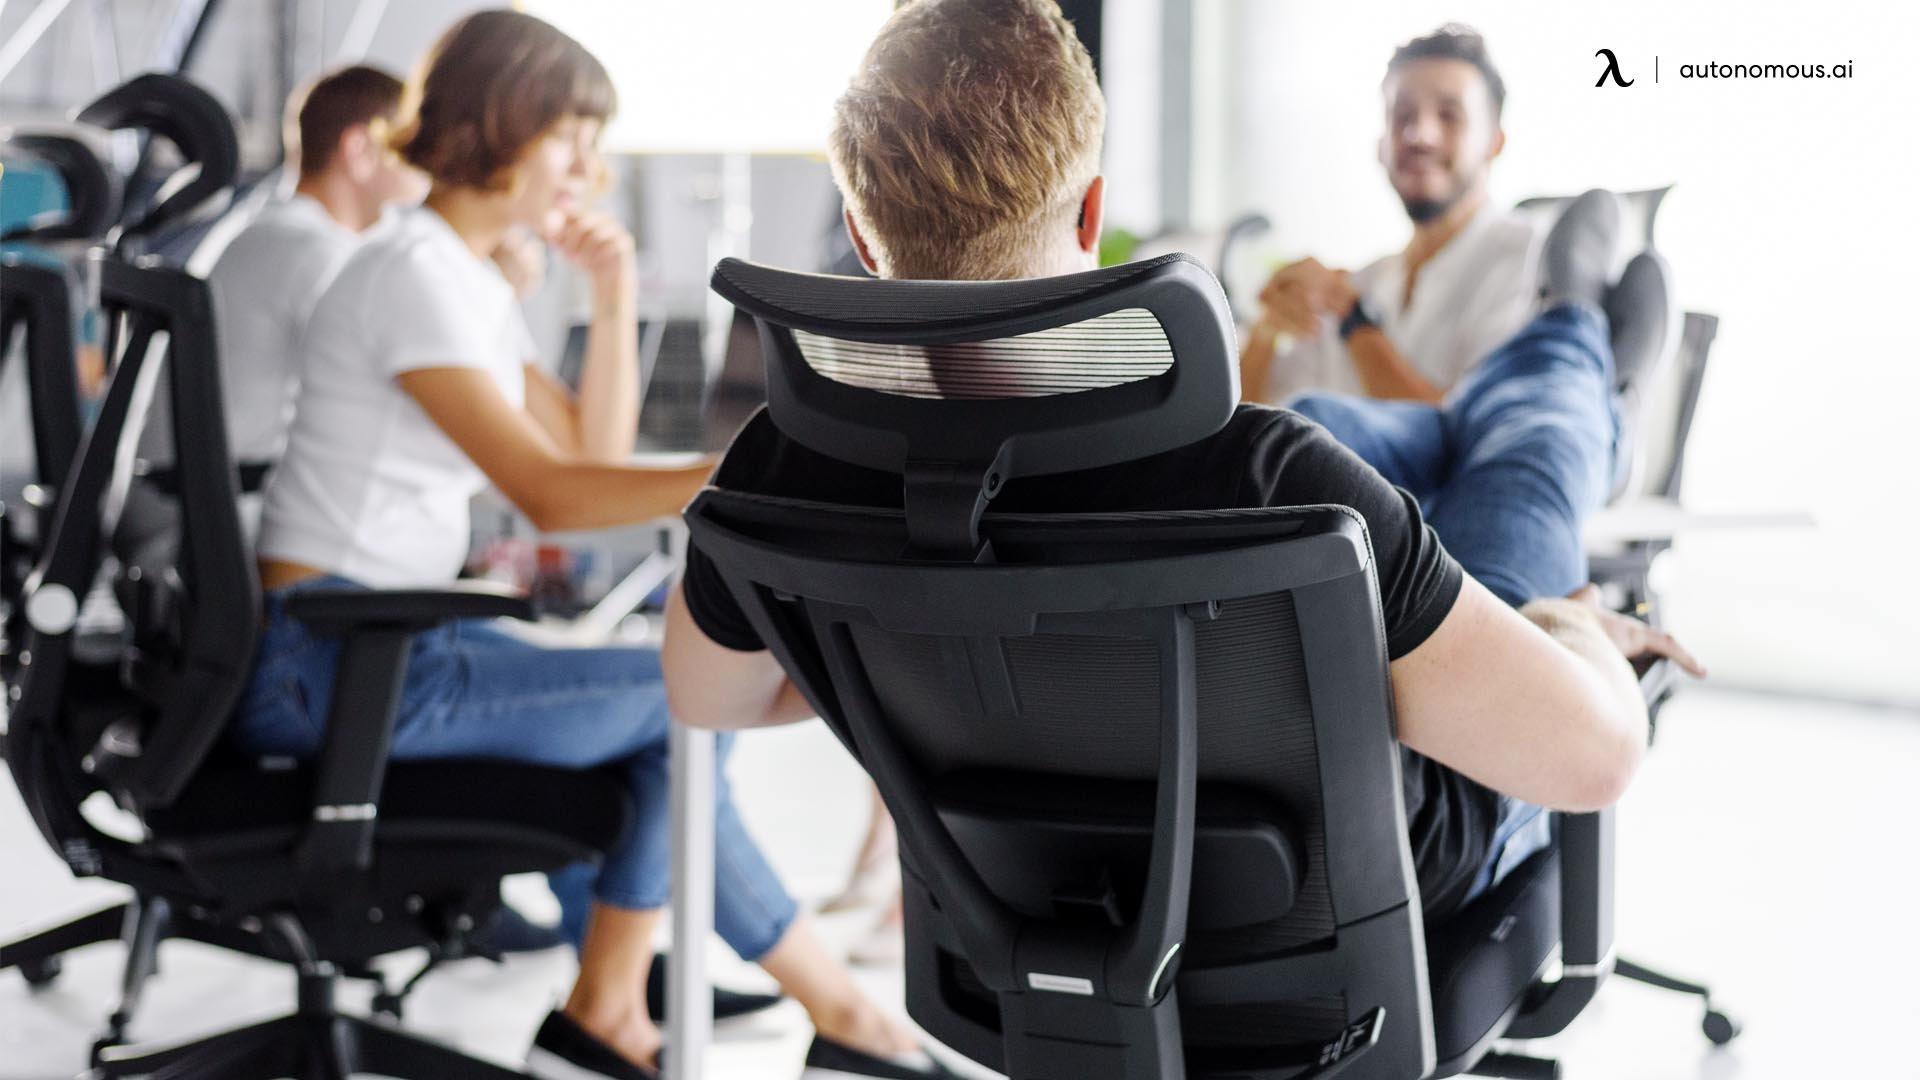 A headrest on Black Friday ergonomic chair